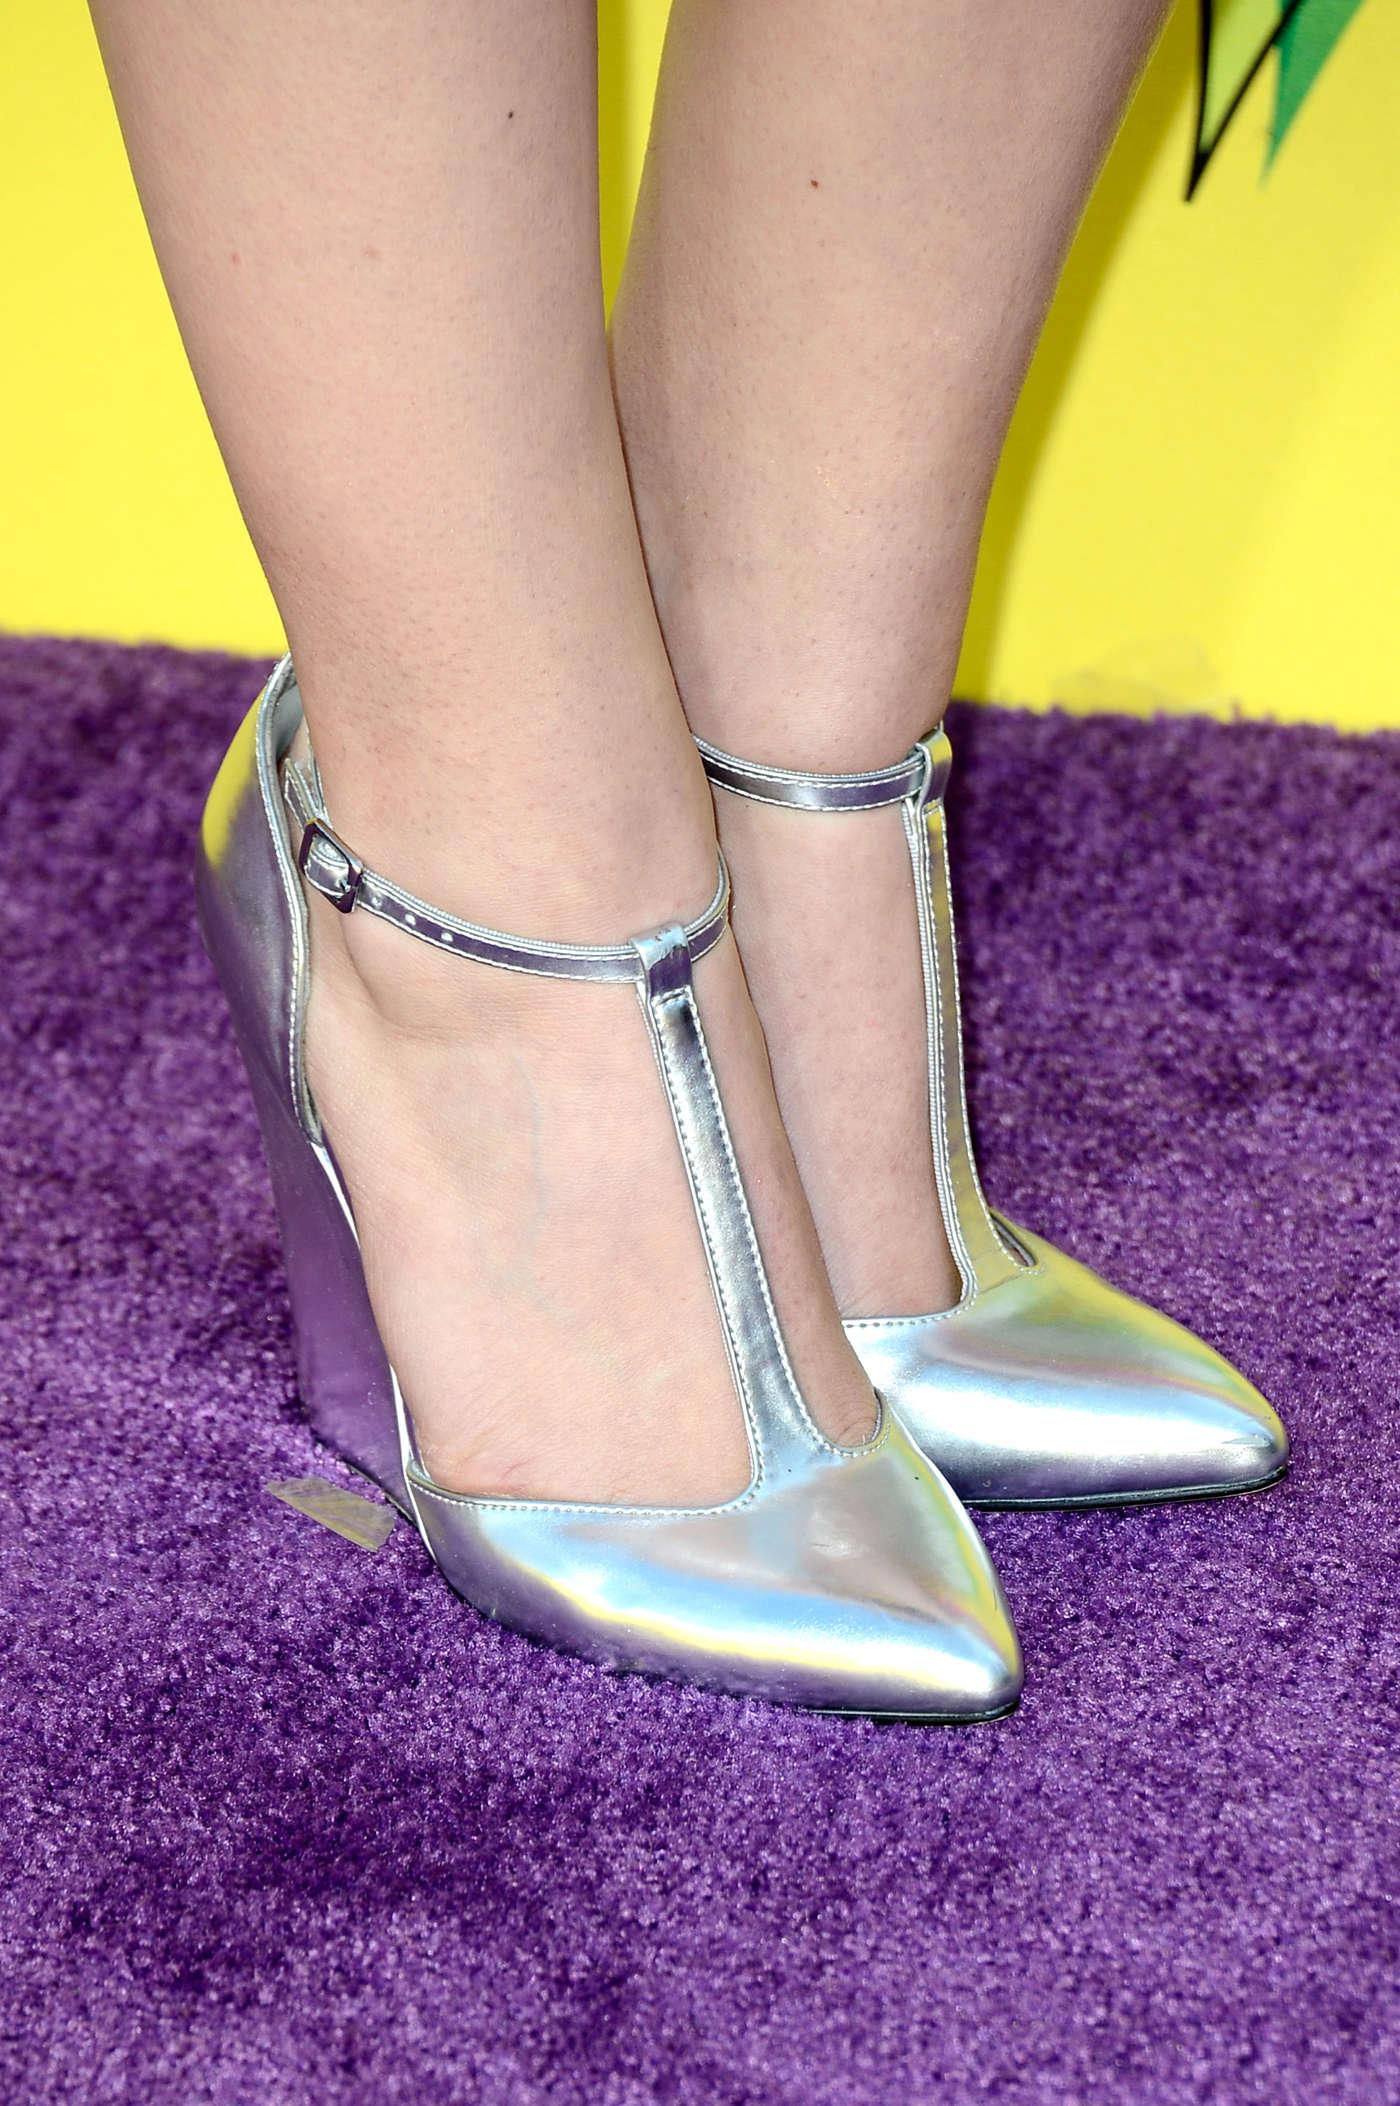 Bridgit Mendler Annual Kids Choice Awards in Los Angeles